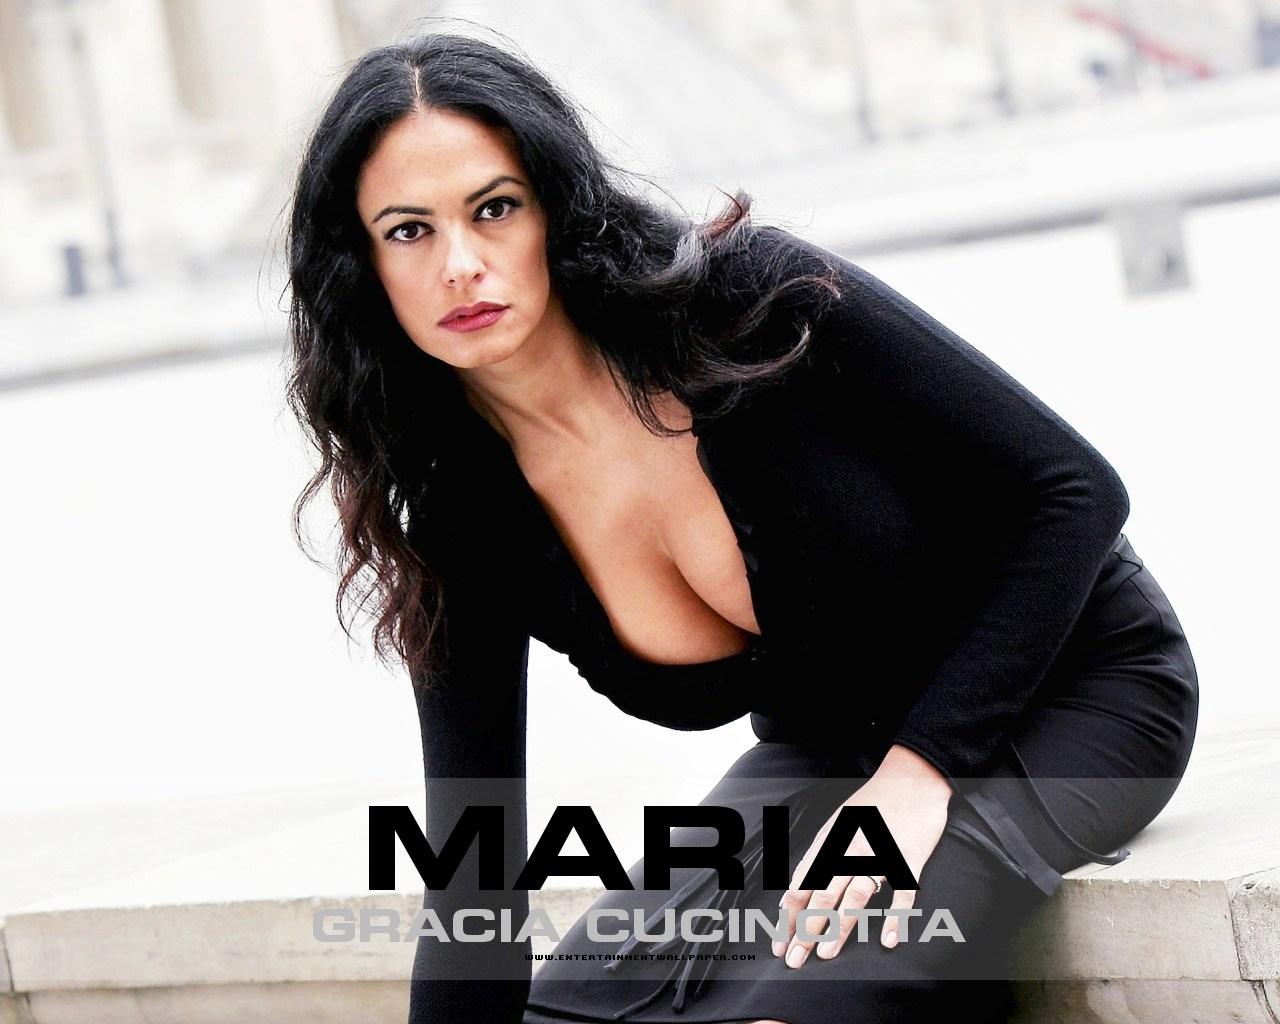 Maria Grazia Cucinotta (born 1968)